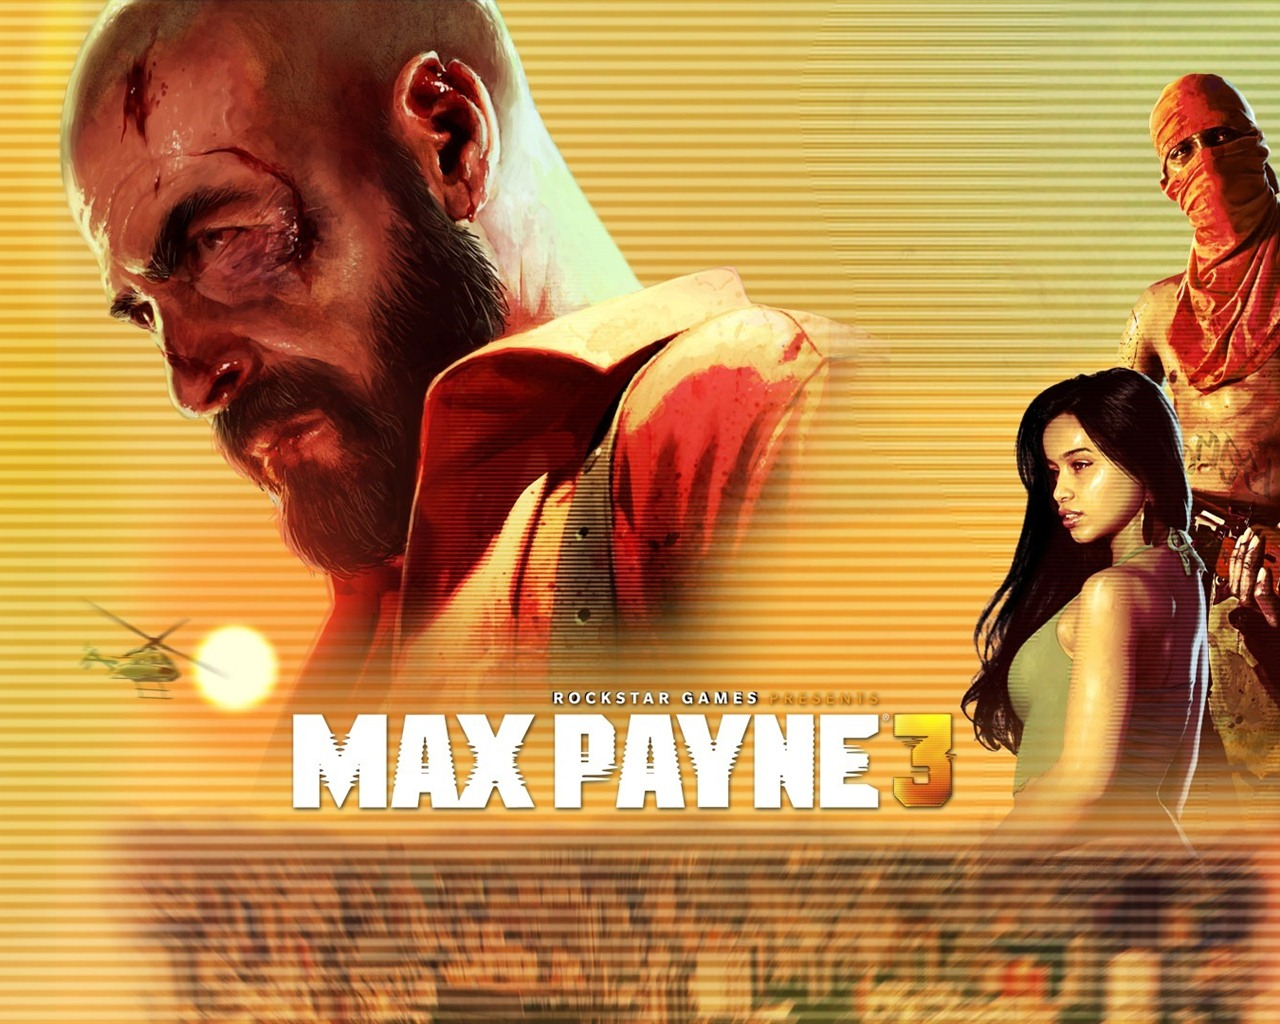 Max Payne 3 Hd Wallpapers 4 1280x1024 Wallpaper Download Max